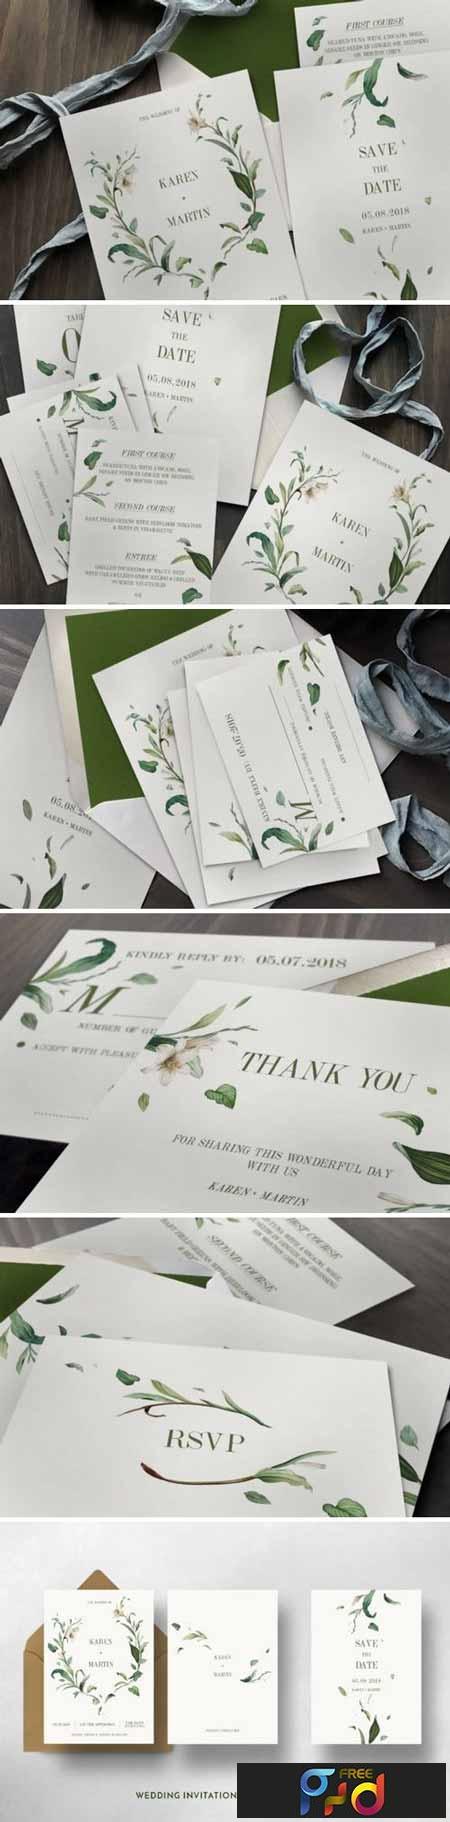 Green Foliage Wedding Invitation Suite 1116824 1